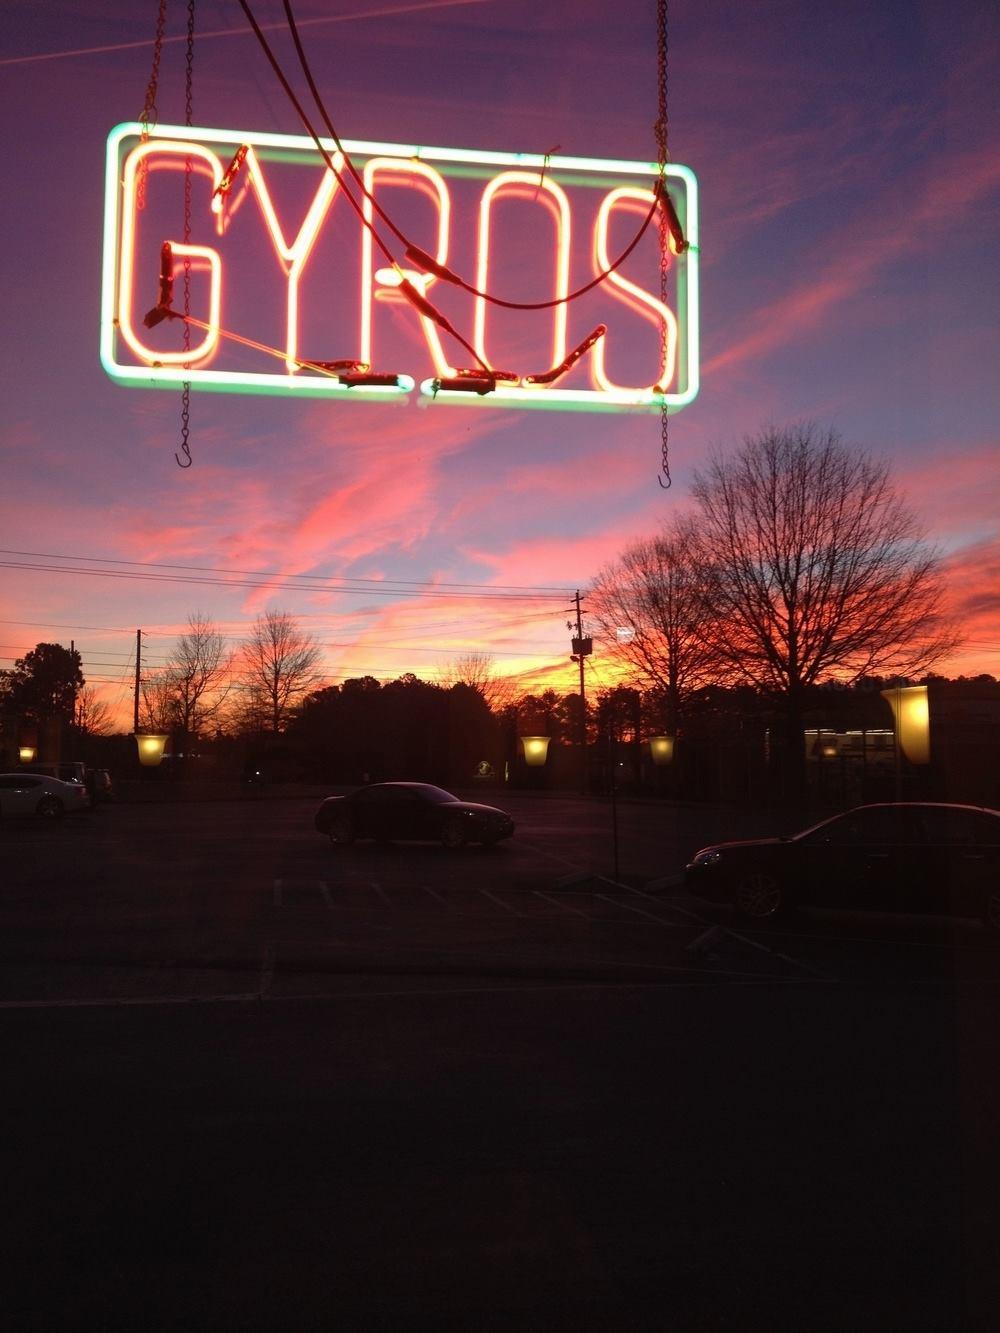 gyros sunset.jpg